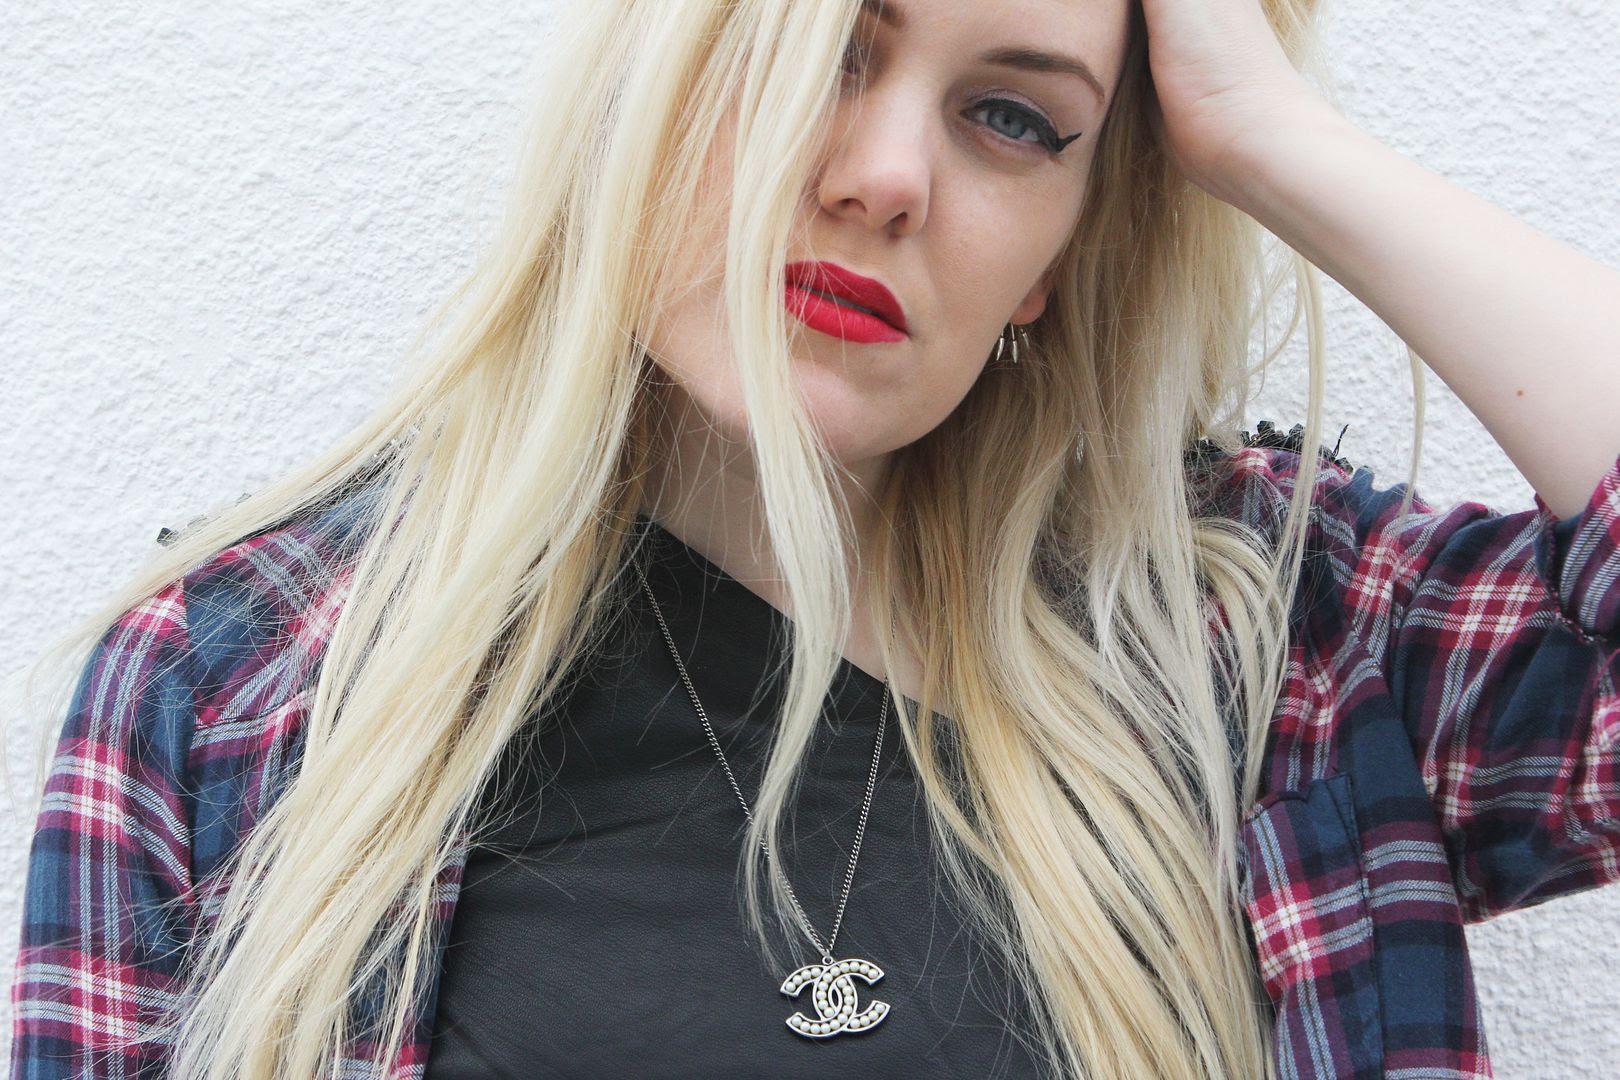 photo hmplaidshirt-beckerman-sisters-twins-blonde-chanelnecklace-narslipstick-dragongirl.jpg